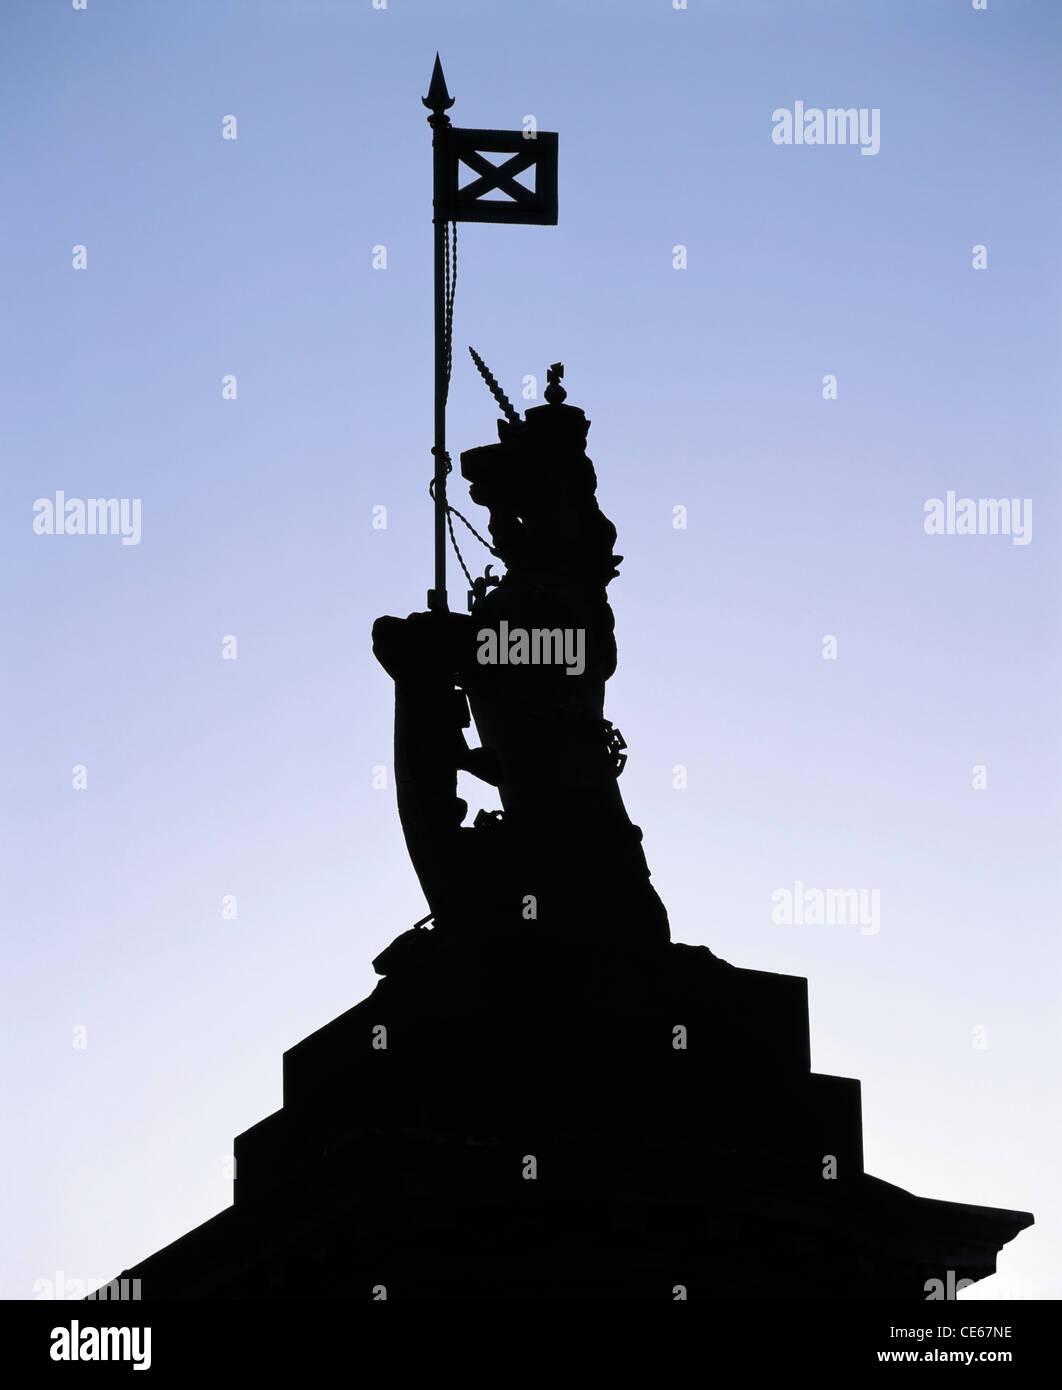 Unicorn and St Andrews cross on a Holyrood Palace Gatepost, Edinburgh, Scotland, UK - Stock Image